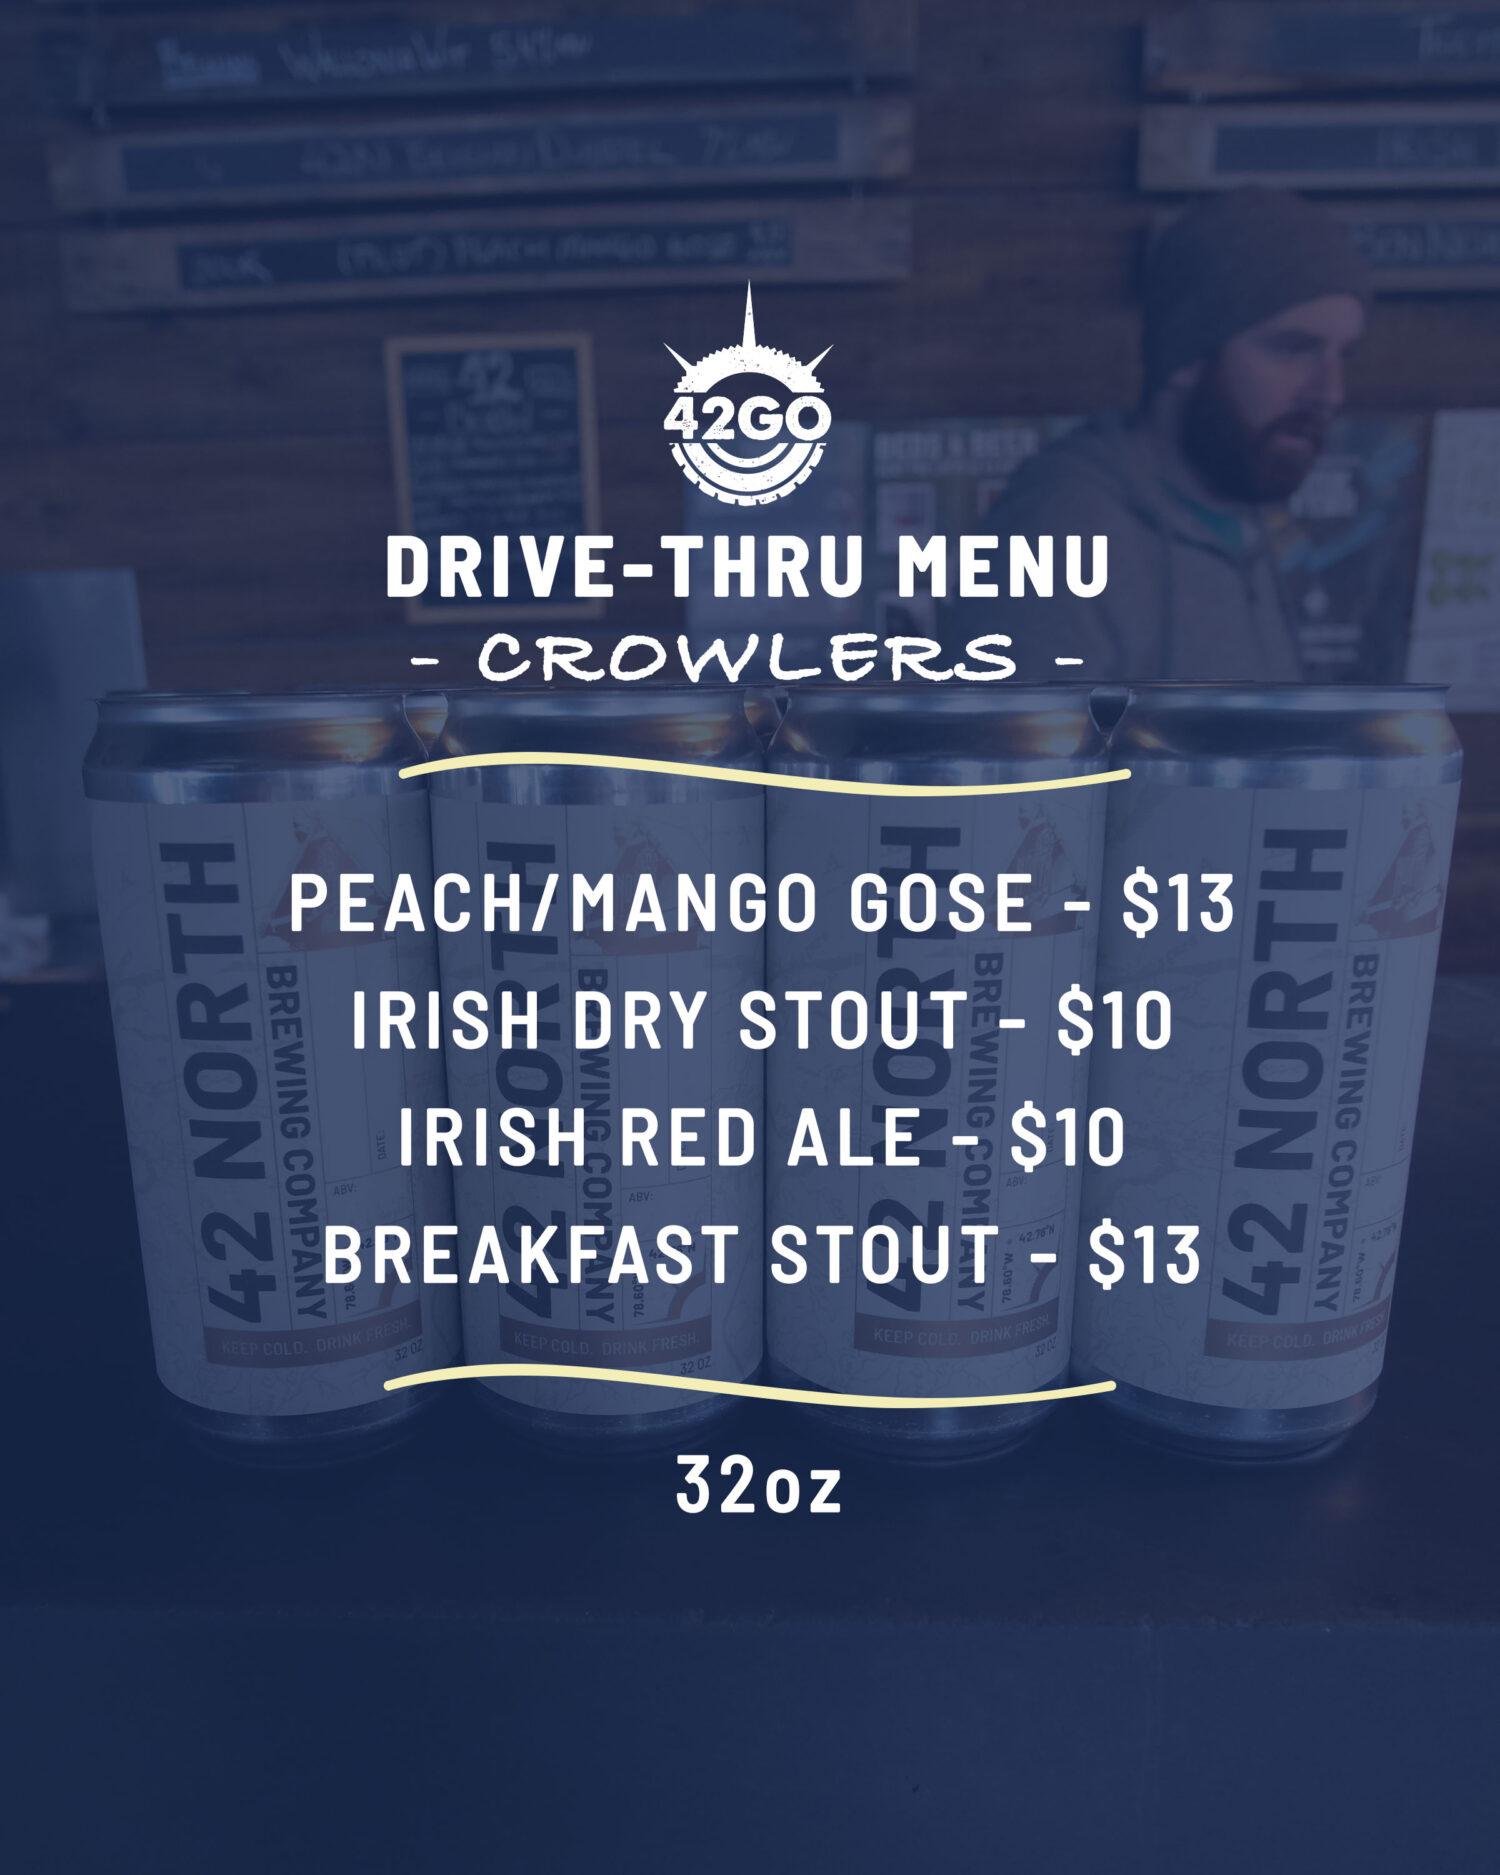 MENU_drive_thru_menu_bcrowler